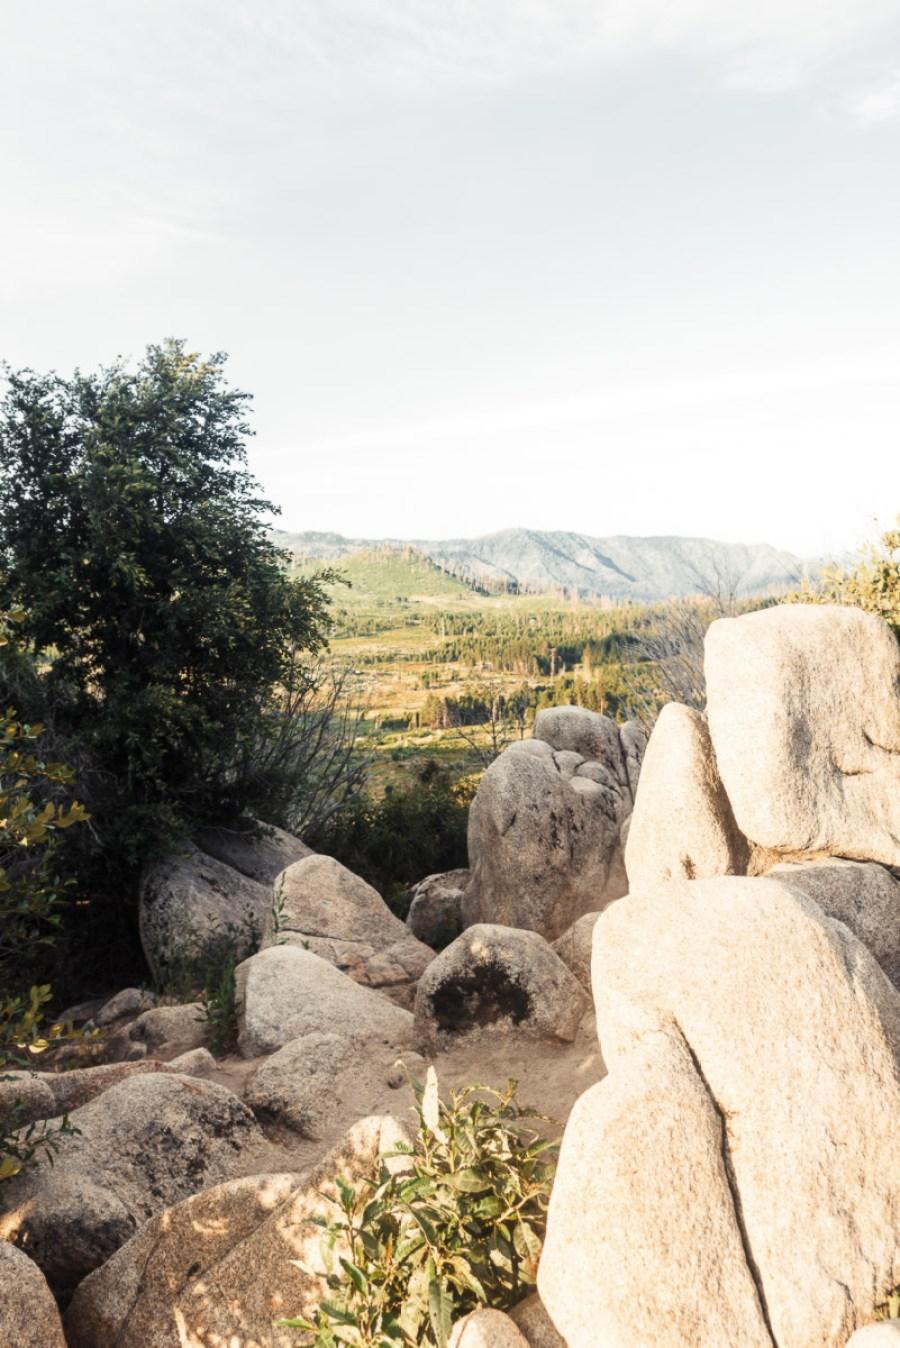 yosemite-national-park-california-u-s-holiday-13